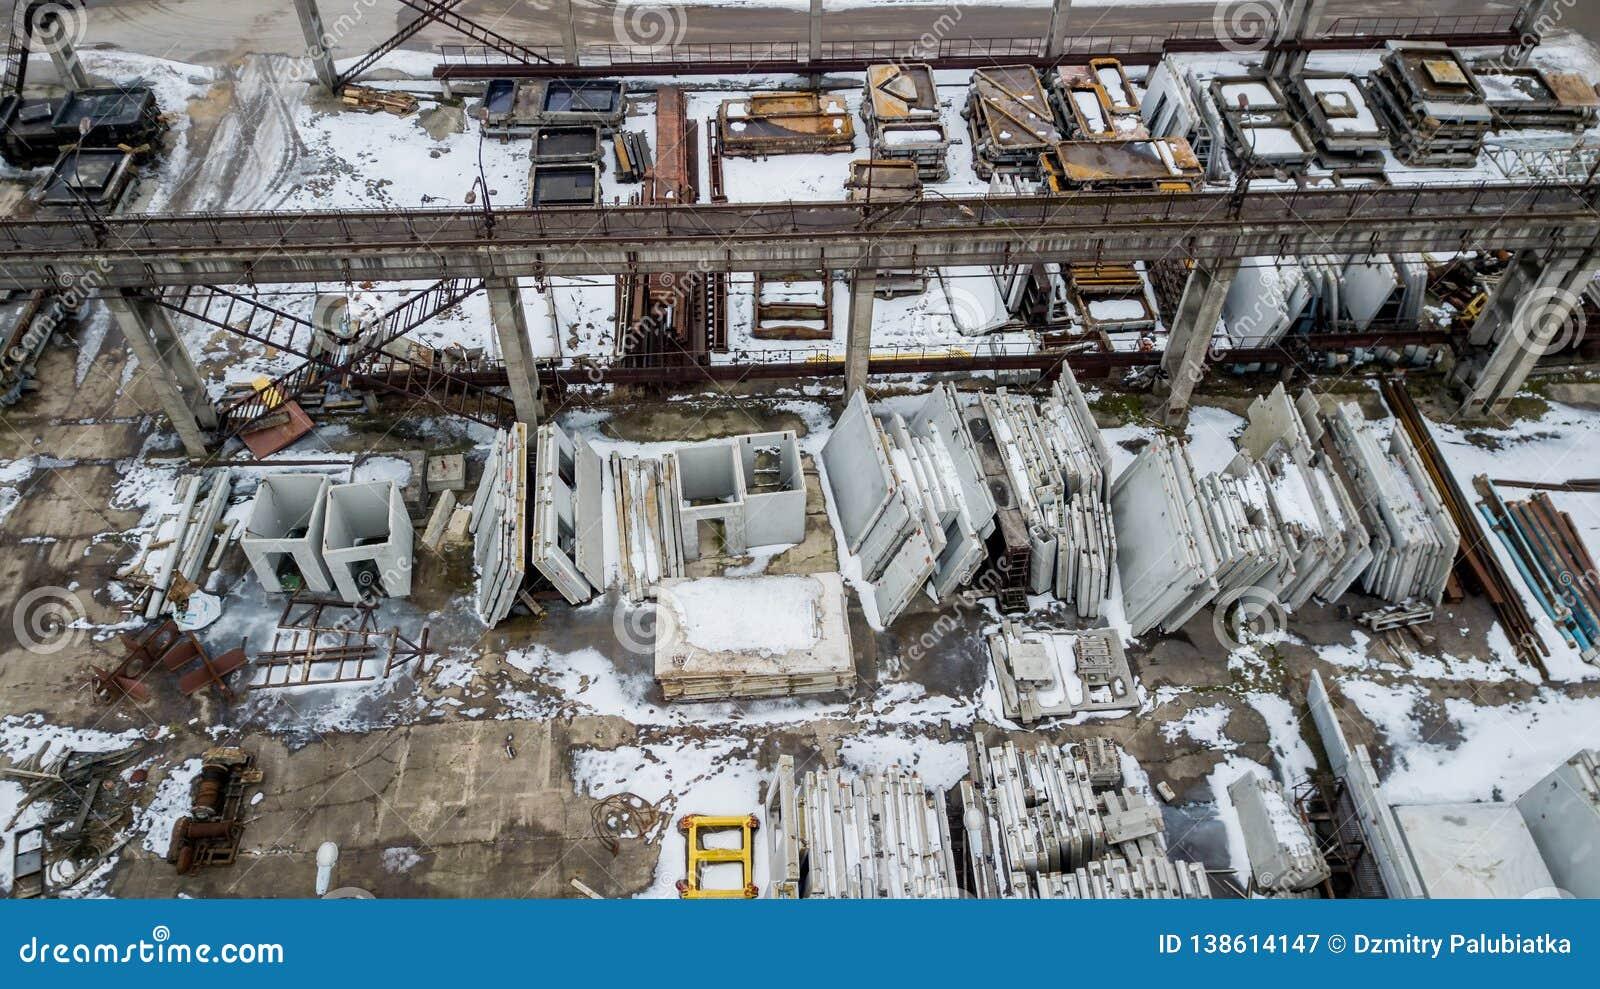 Reinforced concrete structures in an industrial enterprise. Aerial survey